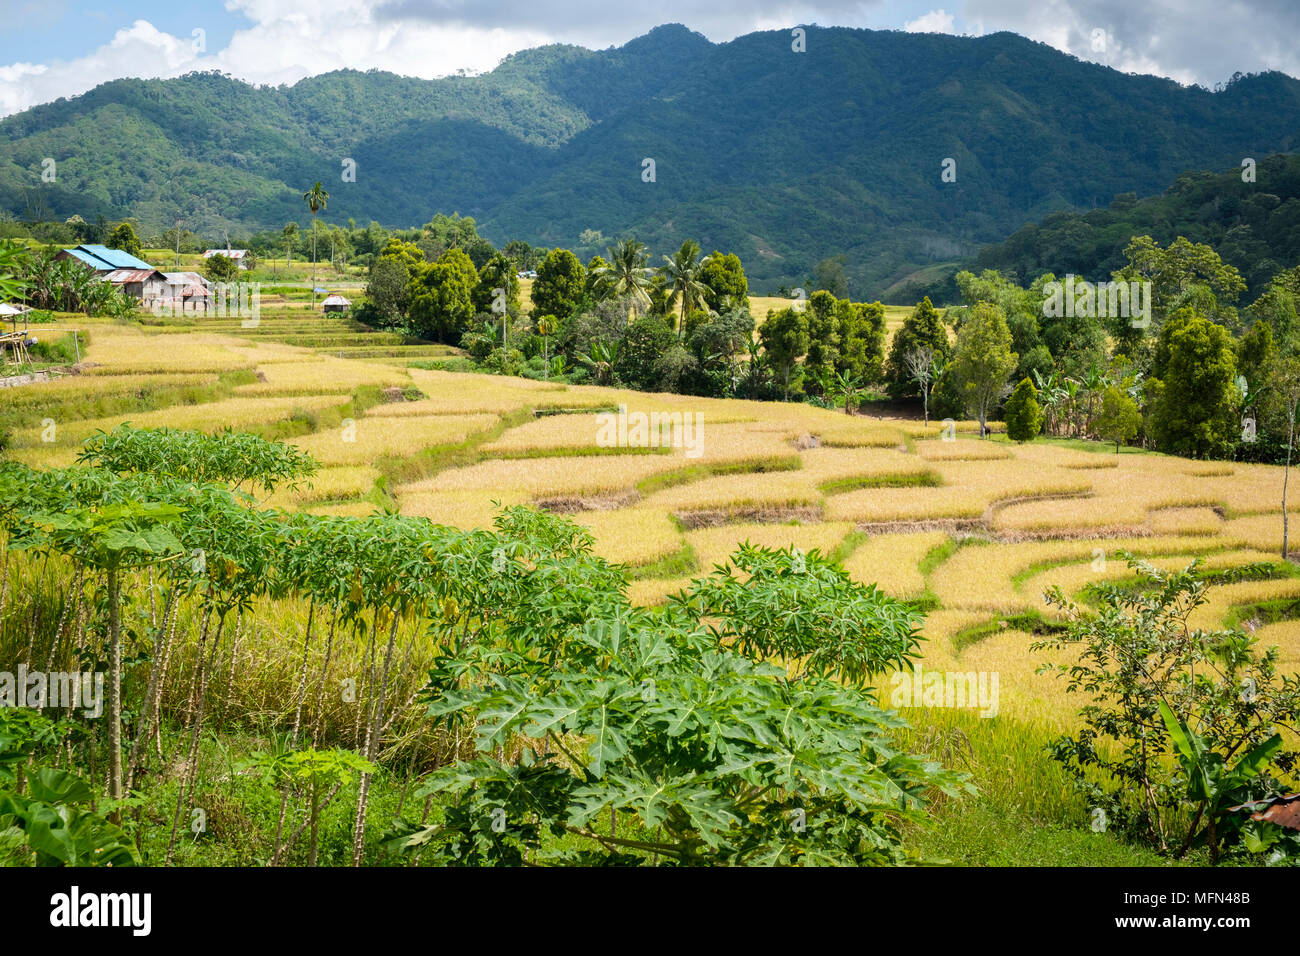 Terraced rice fields near Ende, Flores Island (East Nusa Tenggara), Indonesia. - Stock Image